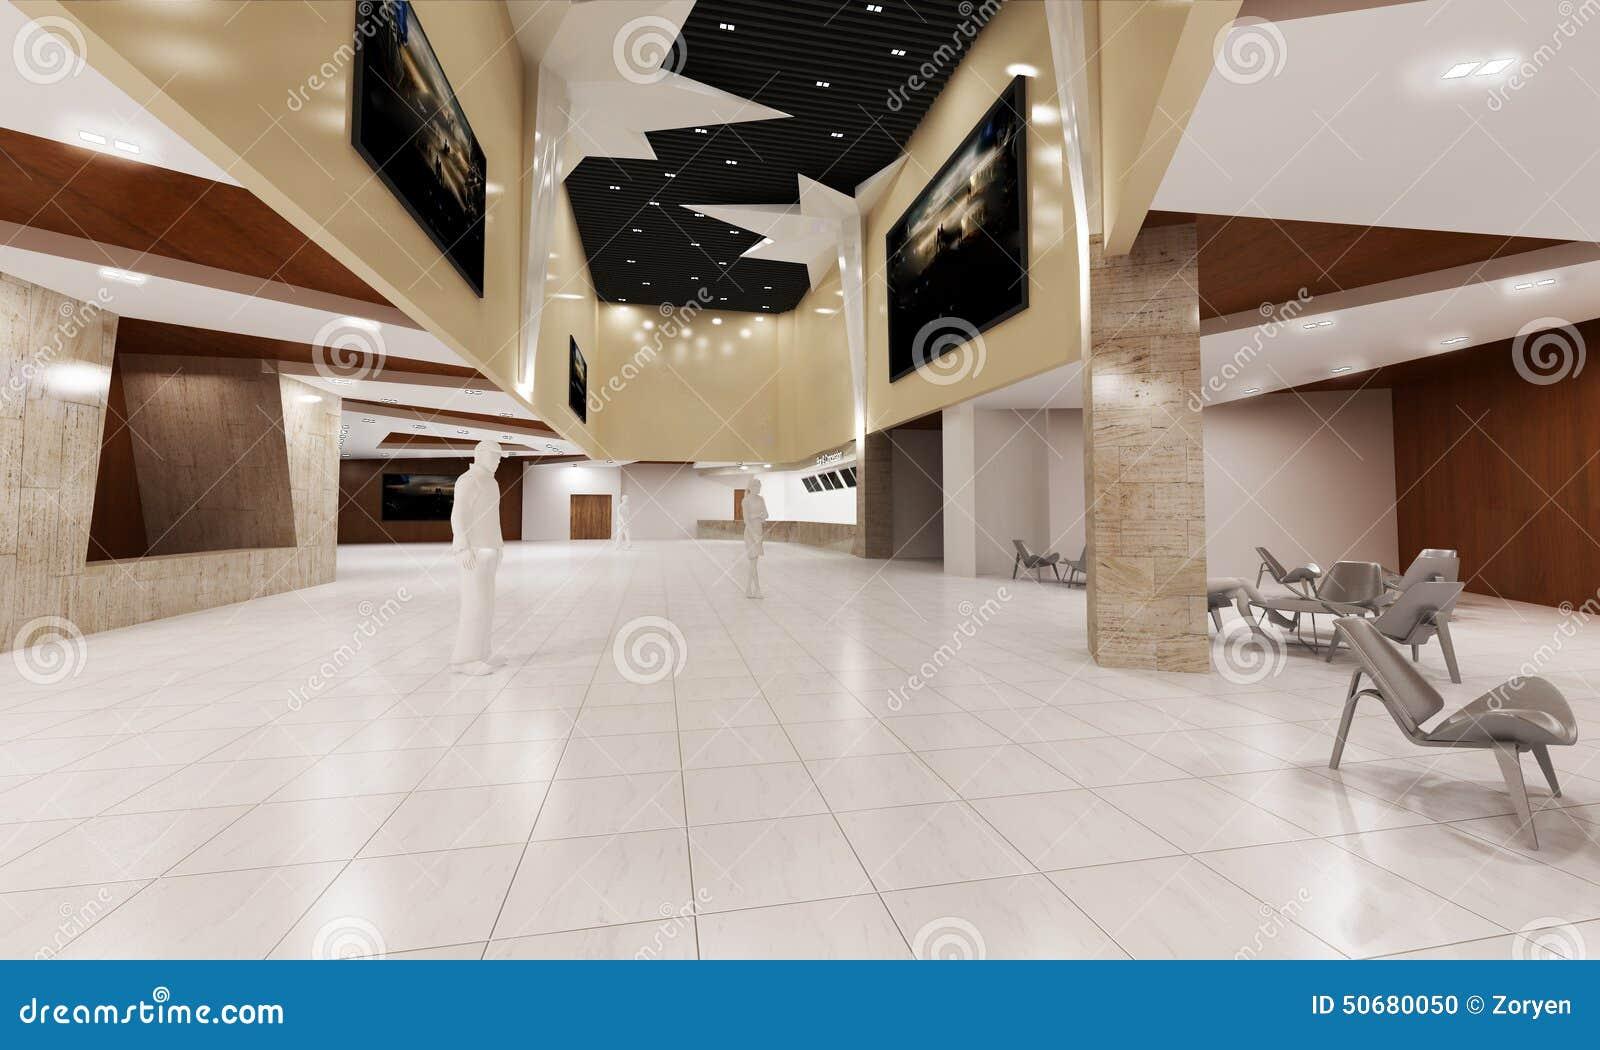 Download 豪华大厦的大厅 库存照片. 图片 包括有 椅子, 位子, 内部, 长毛绒, 商务, 豪华, 里面, 尺寸 - 50680050